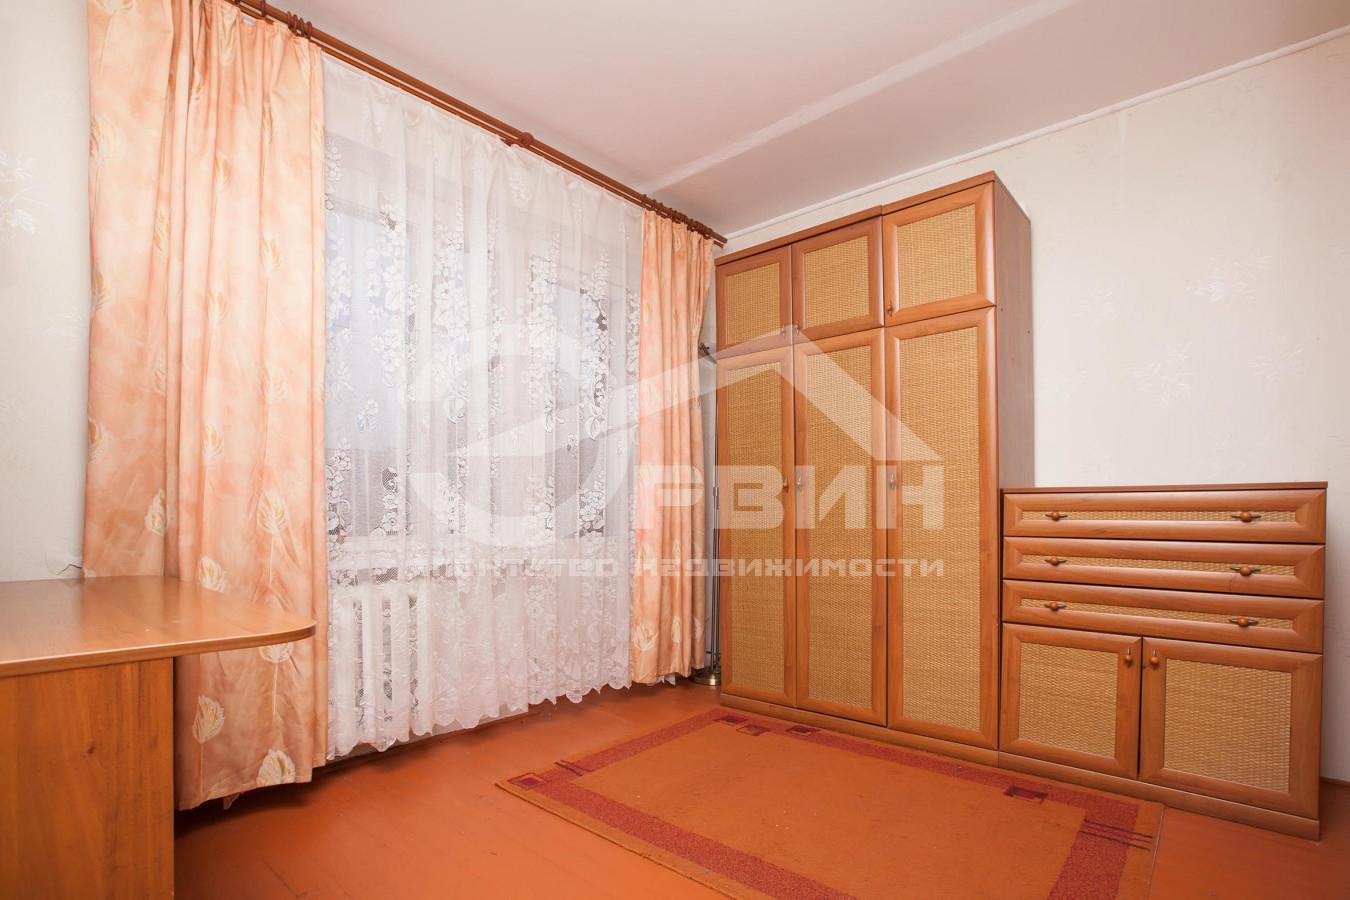 1-комнатная квартира Мукомольная, Улица, 12, Калининград